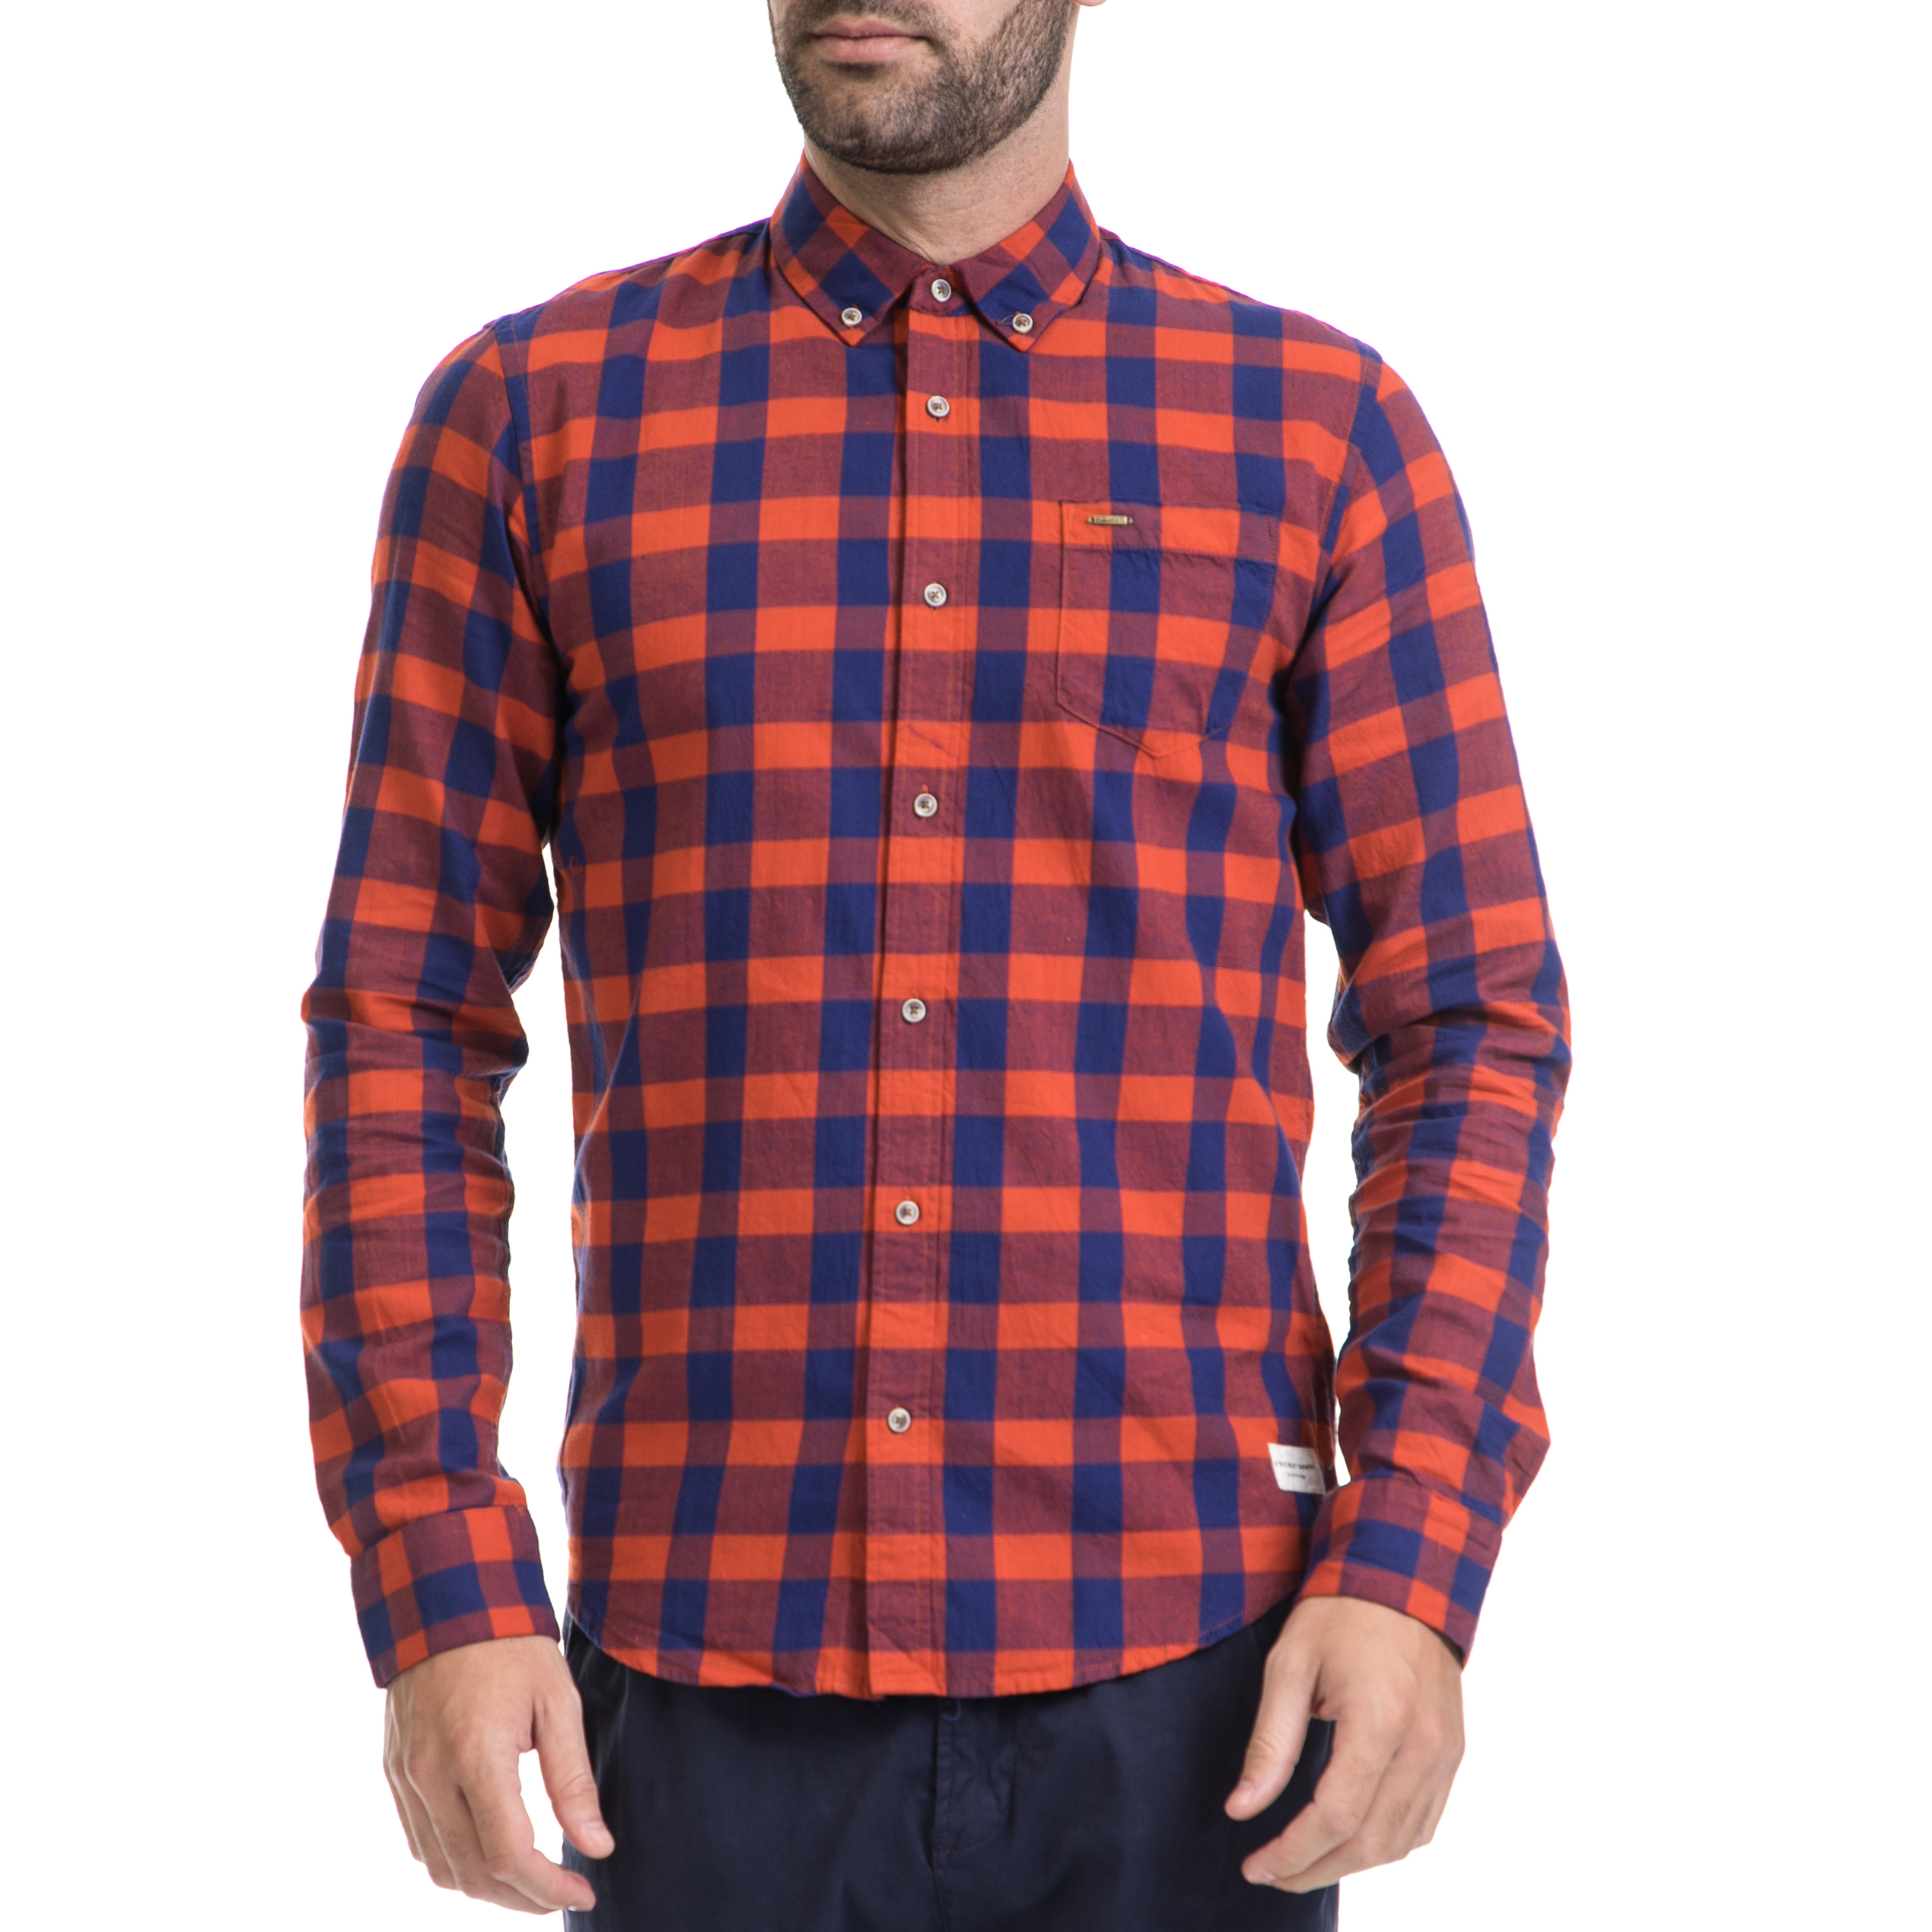 SCOTCH & SODA – Ανδρικό πουκάμισο SCOTCH & SODA μπλε-κόκκινο